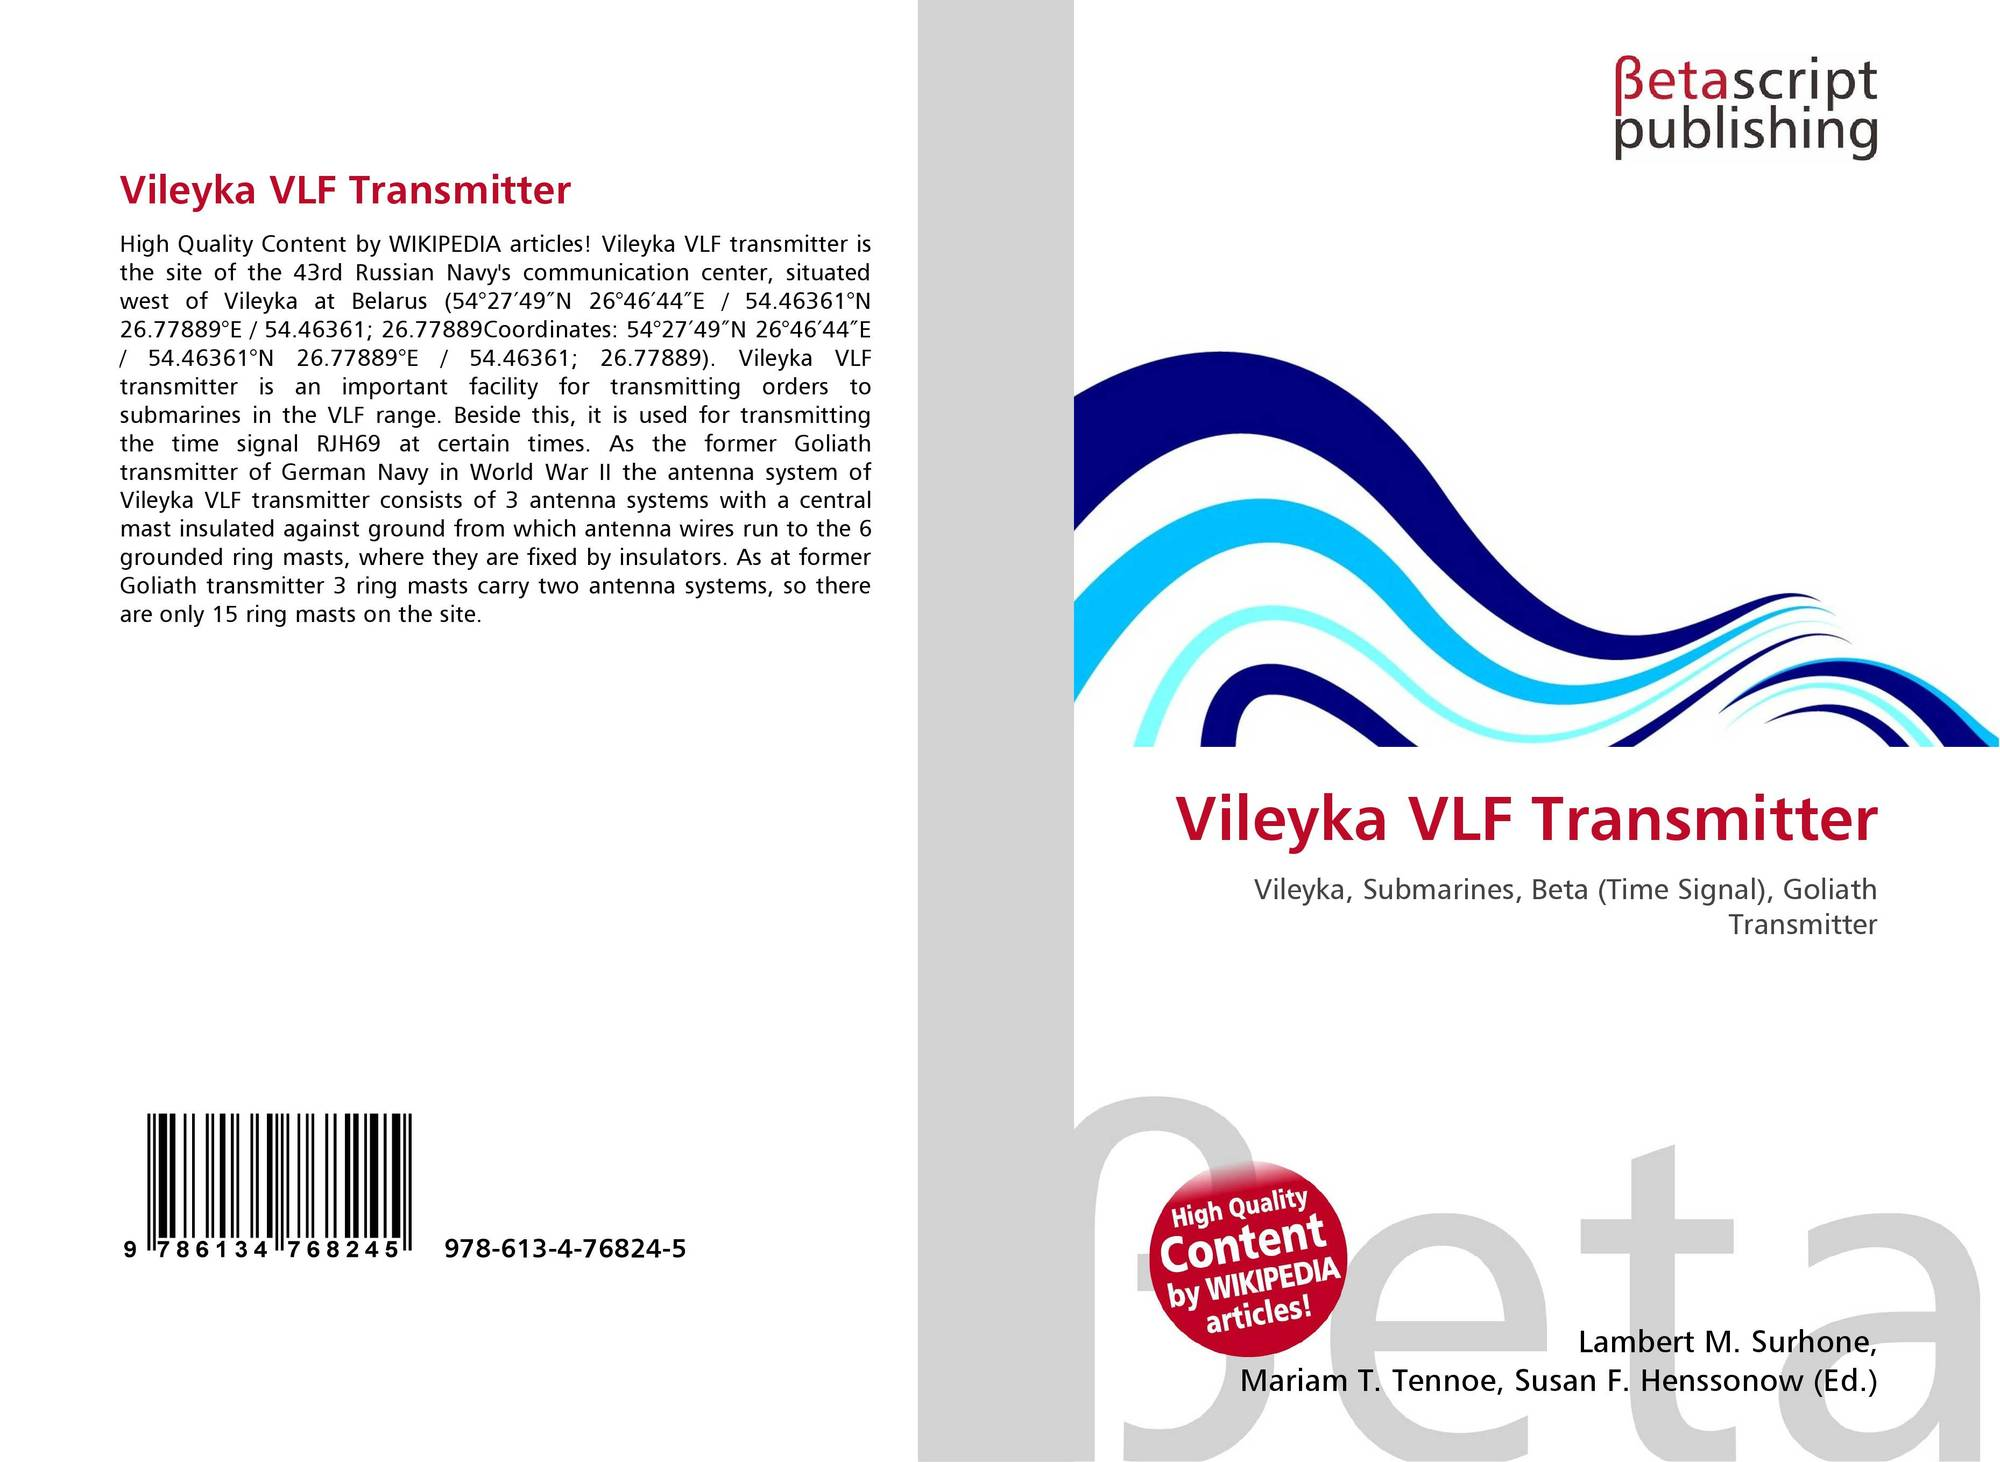 Vileyka VLF Transmitter, 978-613-4-76824-5, 6134768243